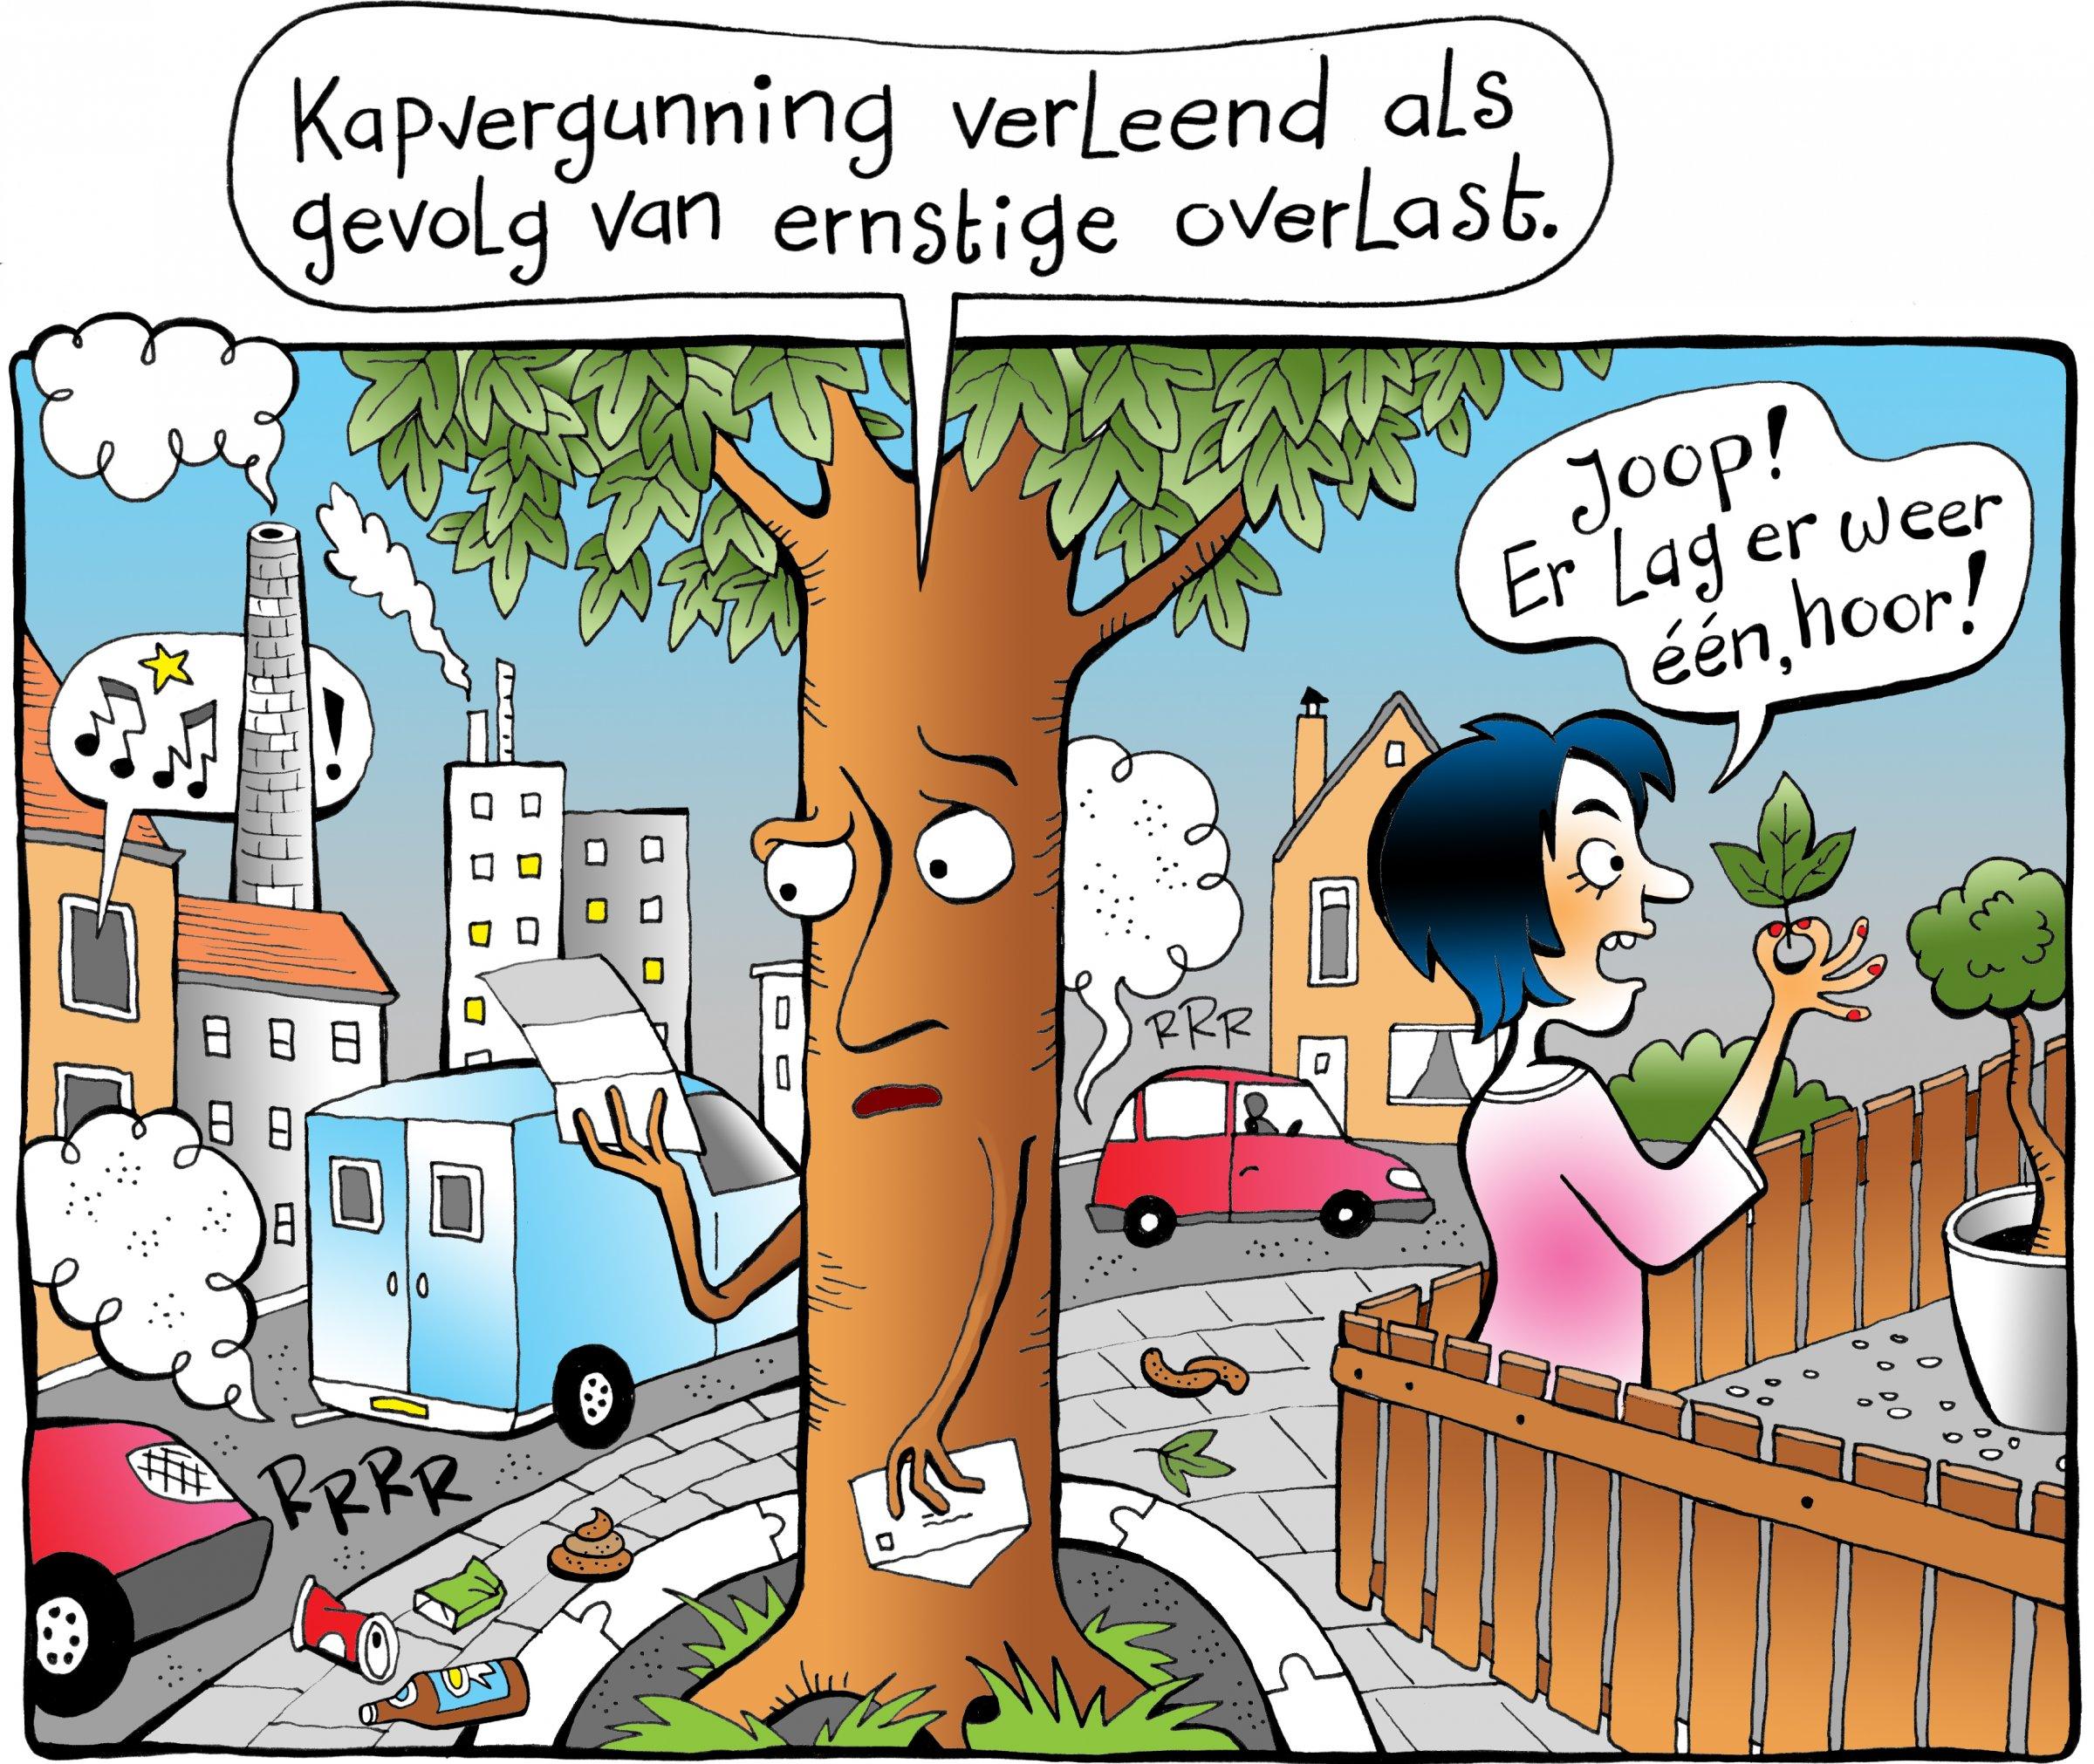 http://www.sandradehaan.nl/.